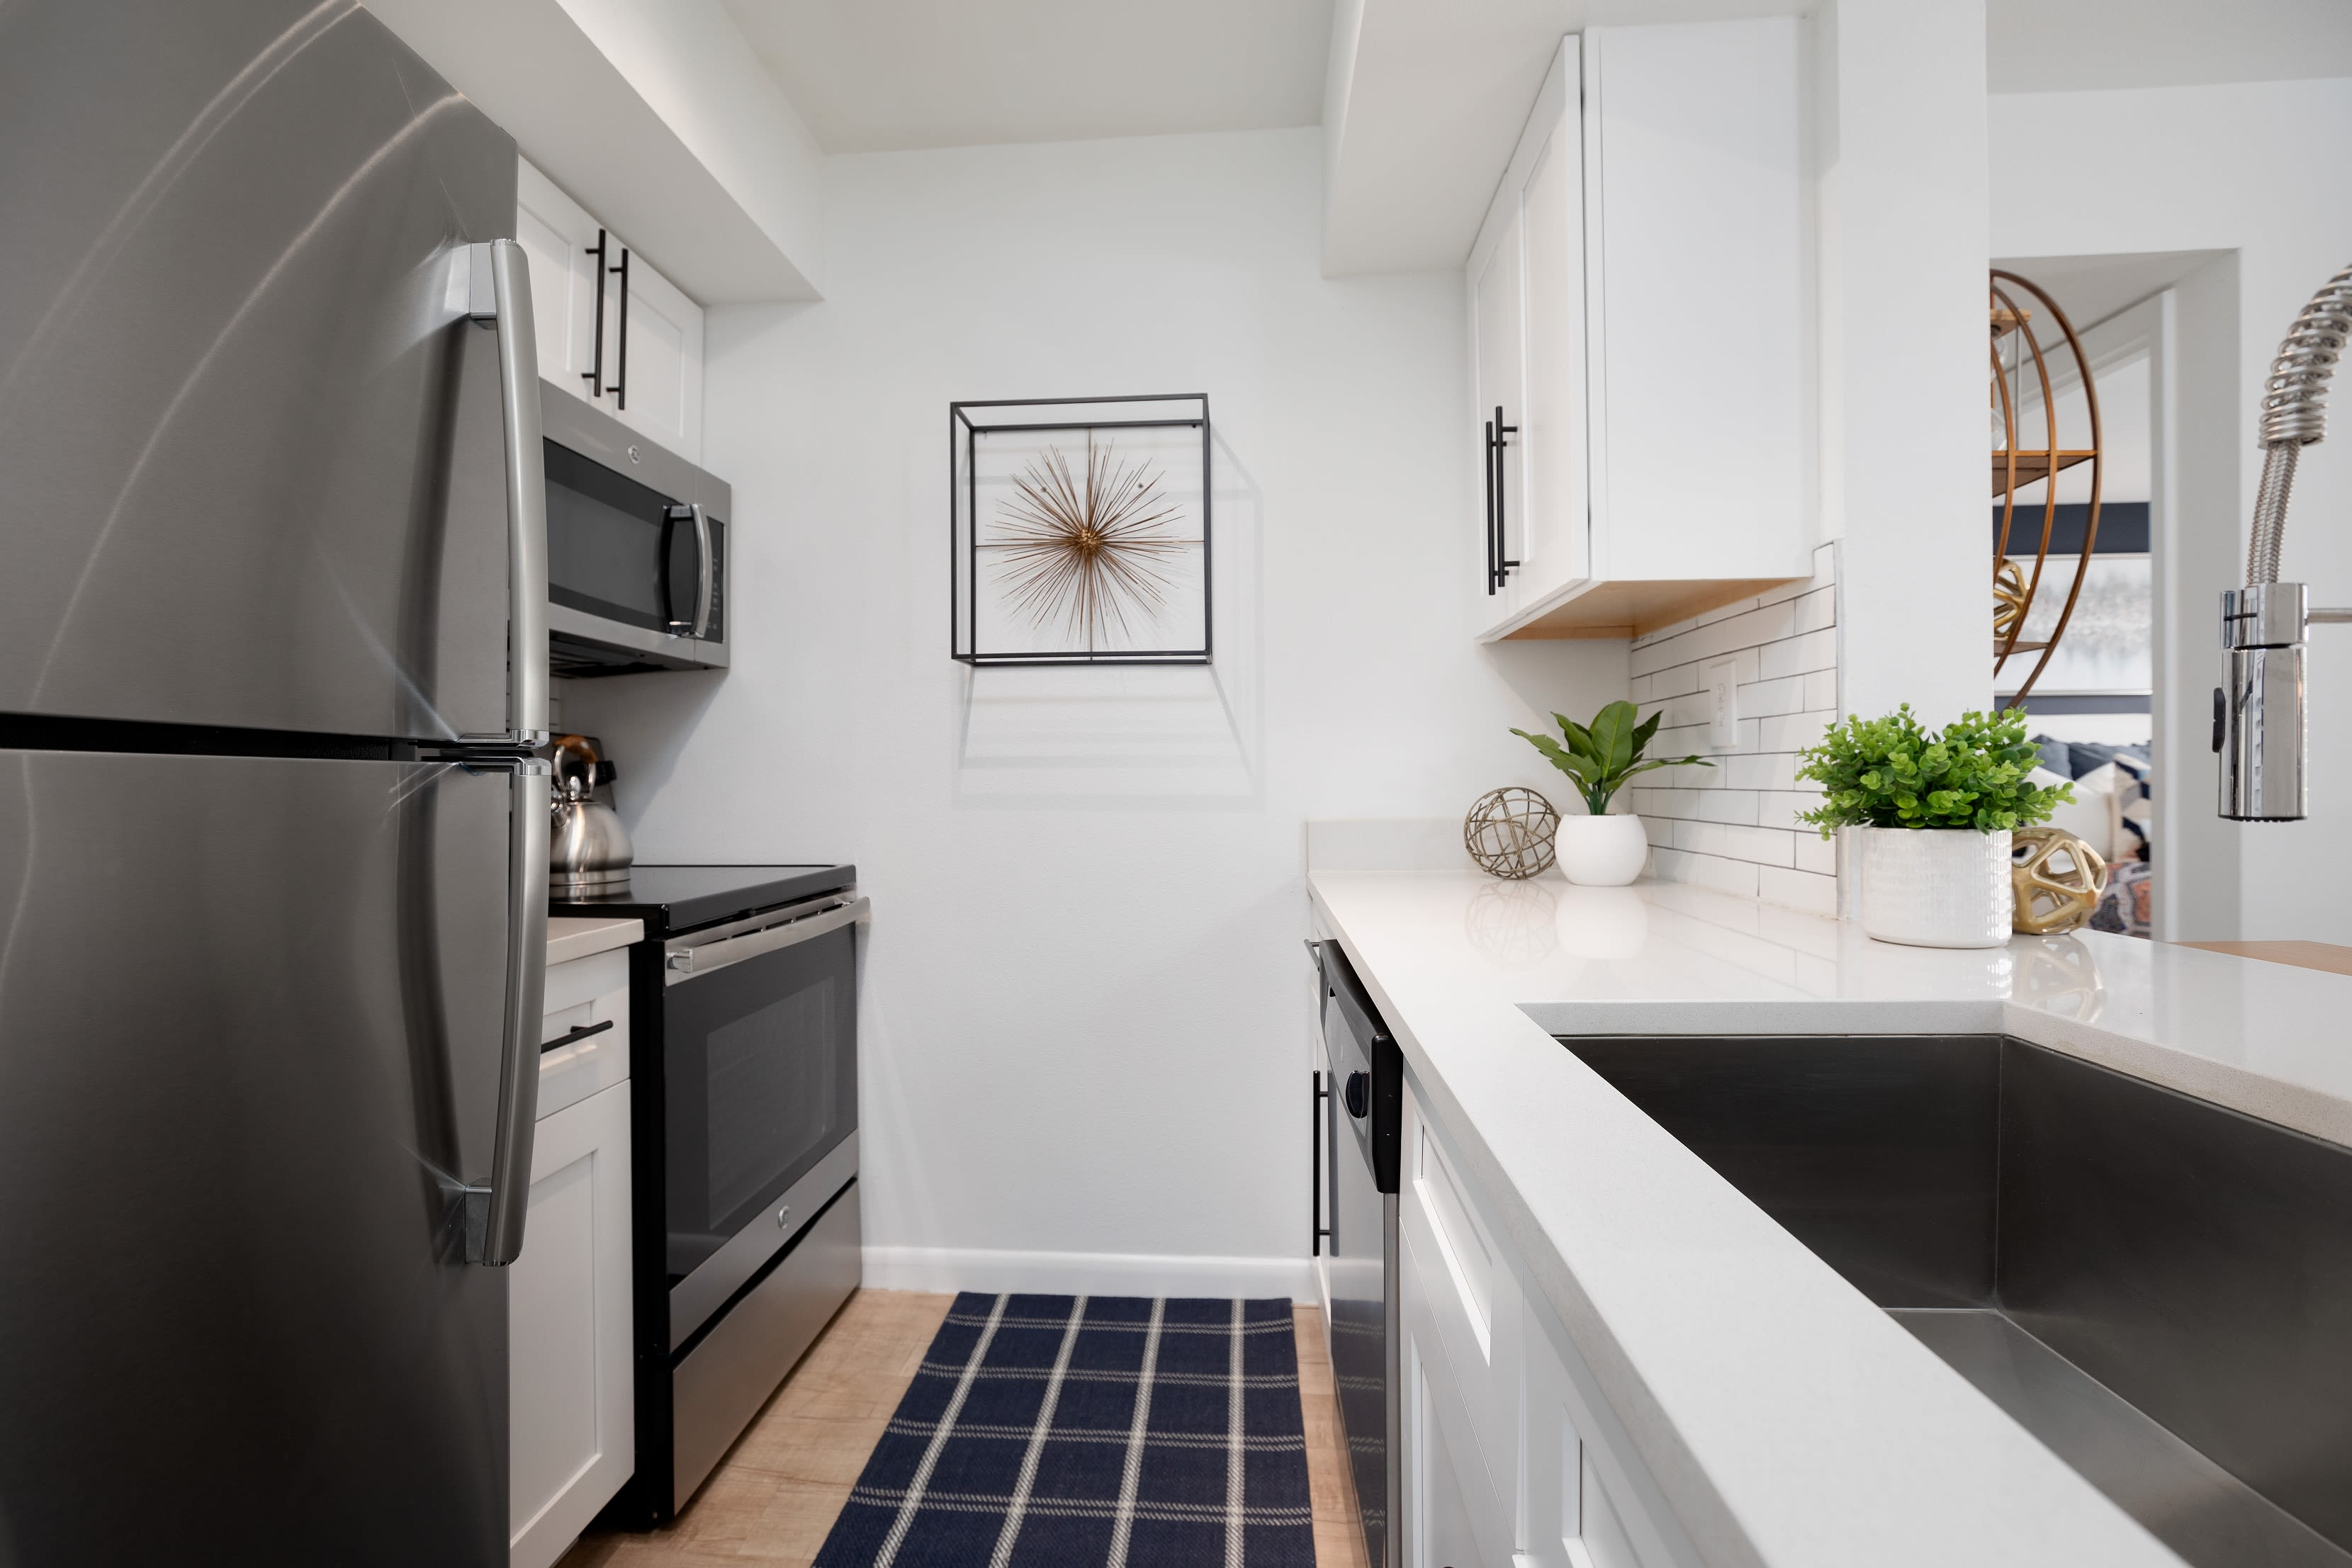 Resident kitchen at Cielo Boca in Boca Raton, Florida